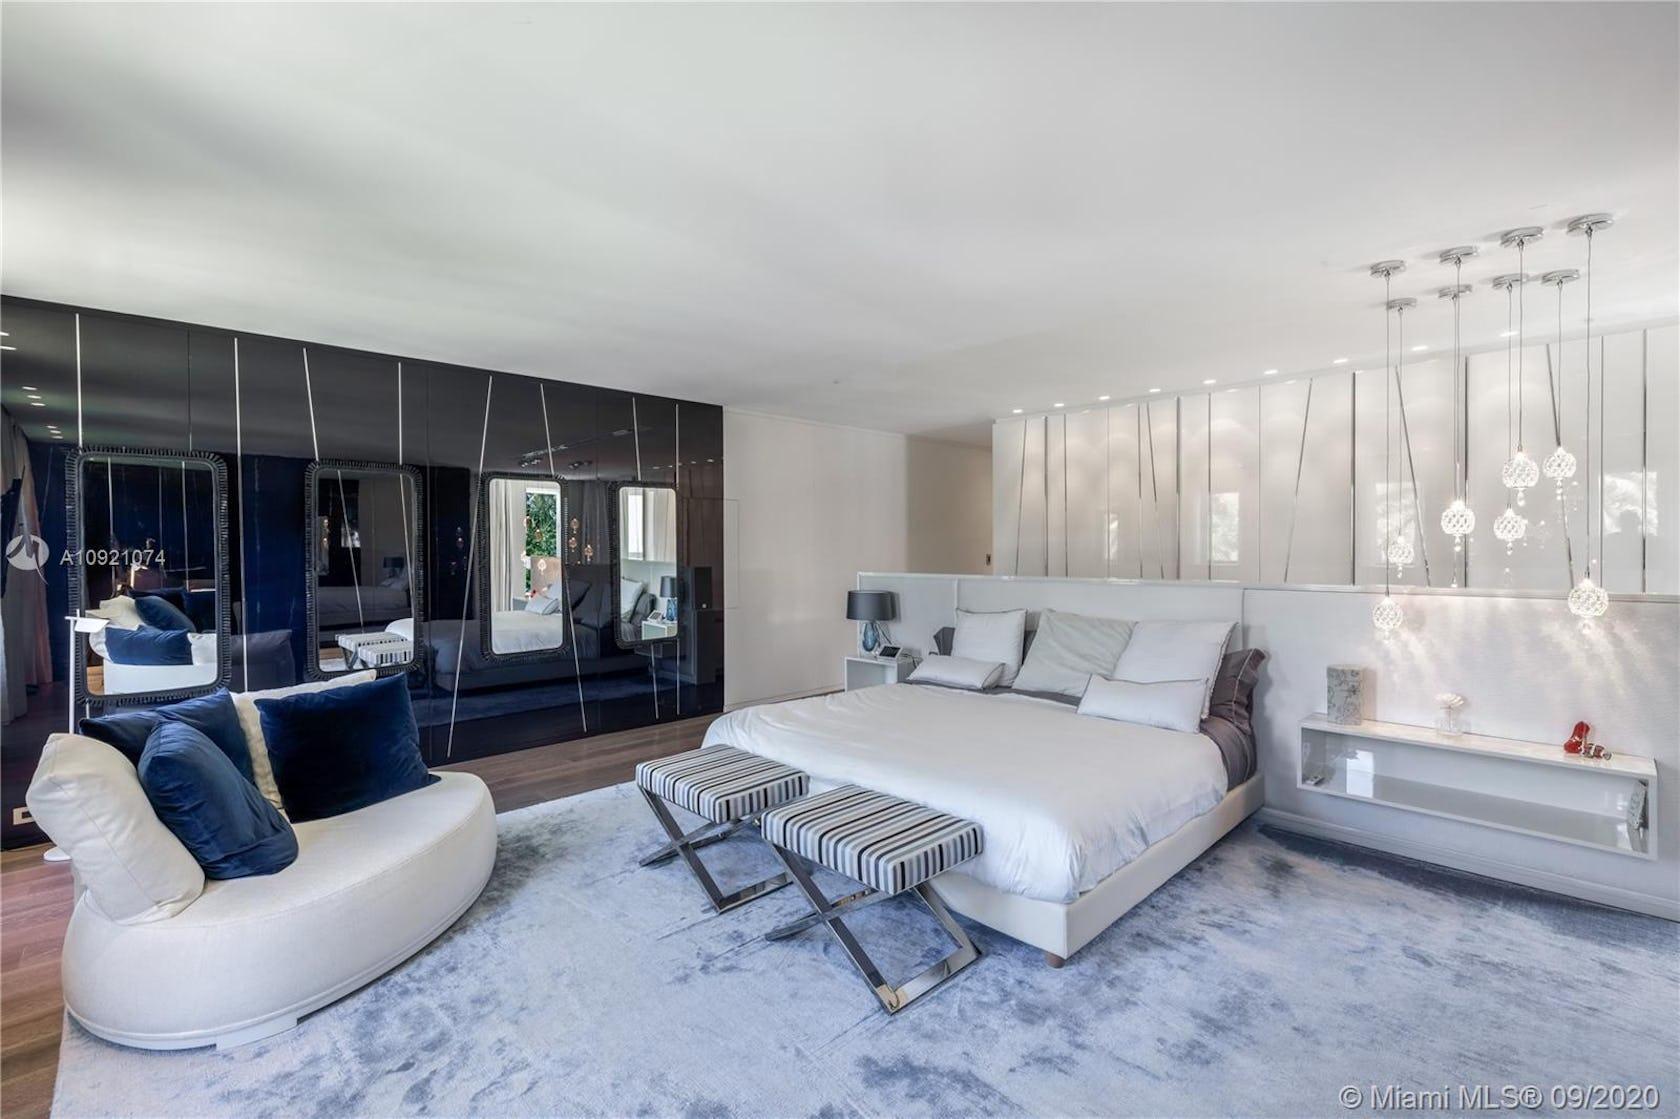 furniture room indoors bedroom living room interior design rug